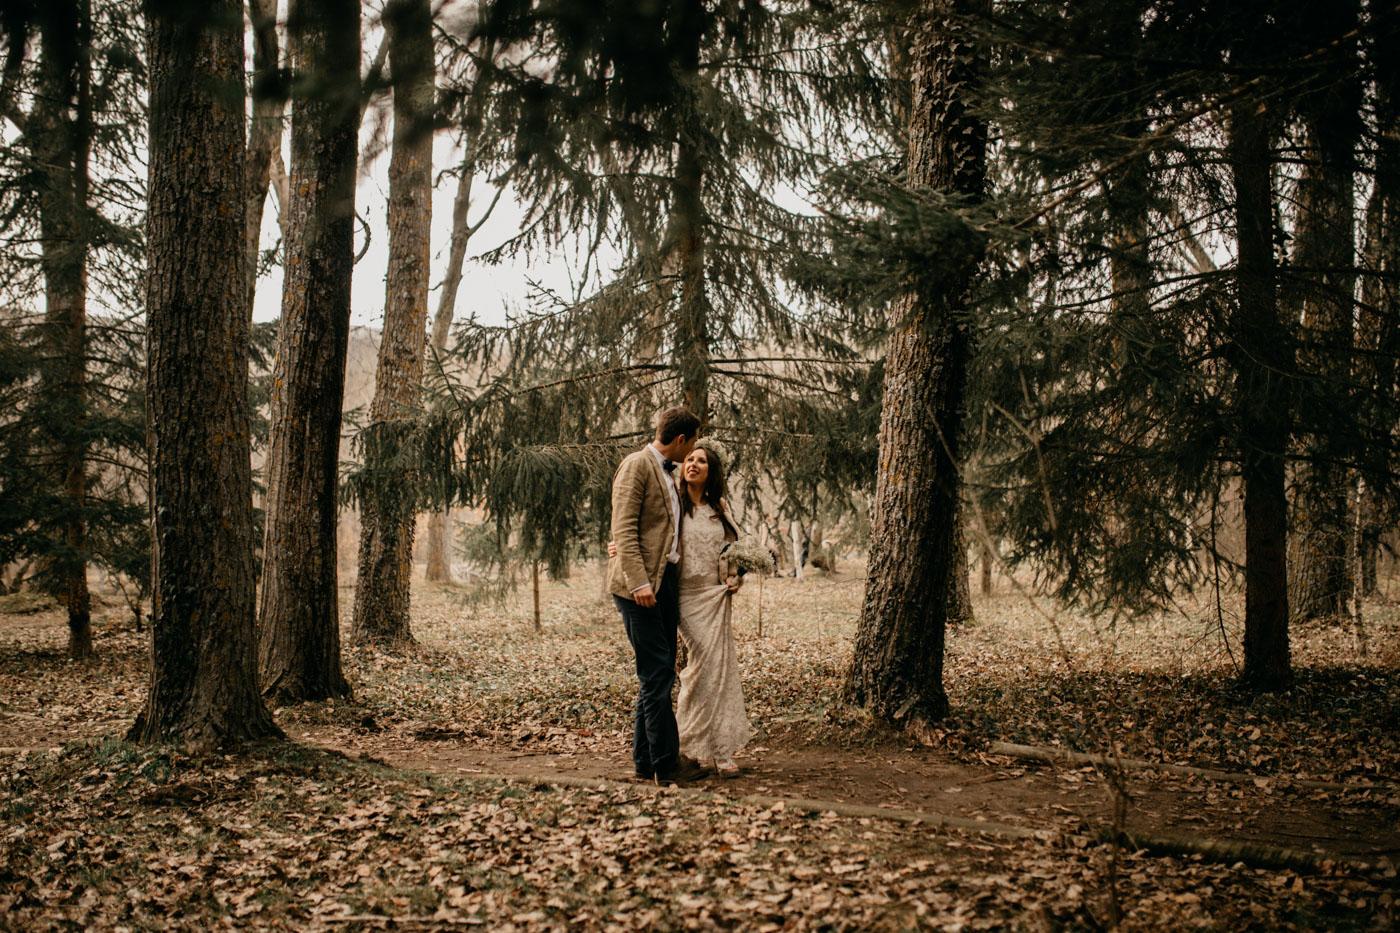 Velvet-Hush-fotografos-boda-al-aire-libre-madrid-097